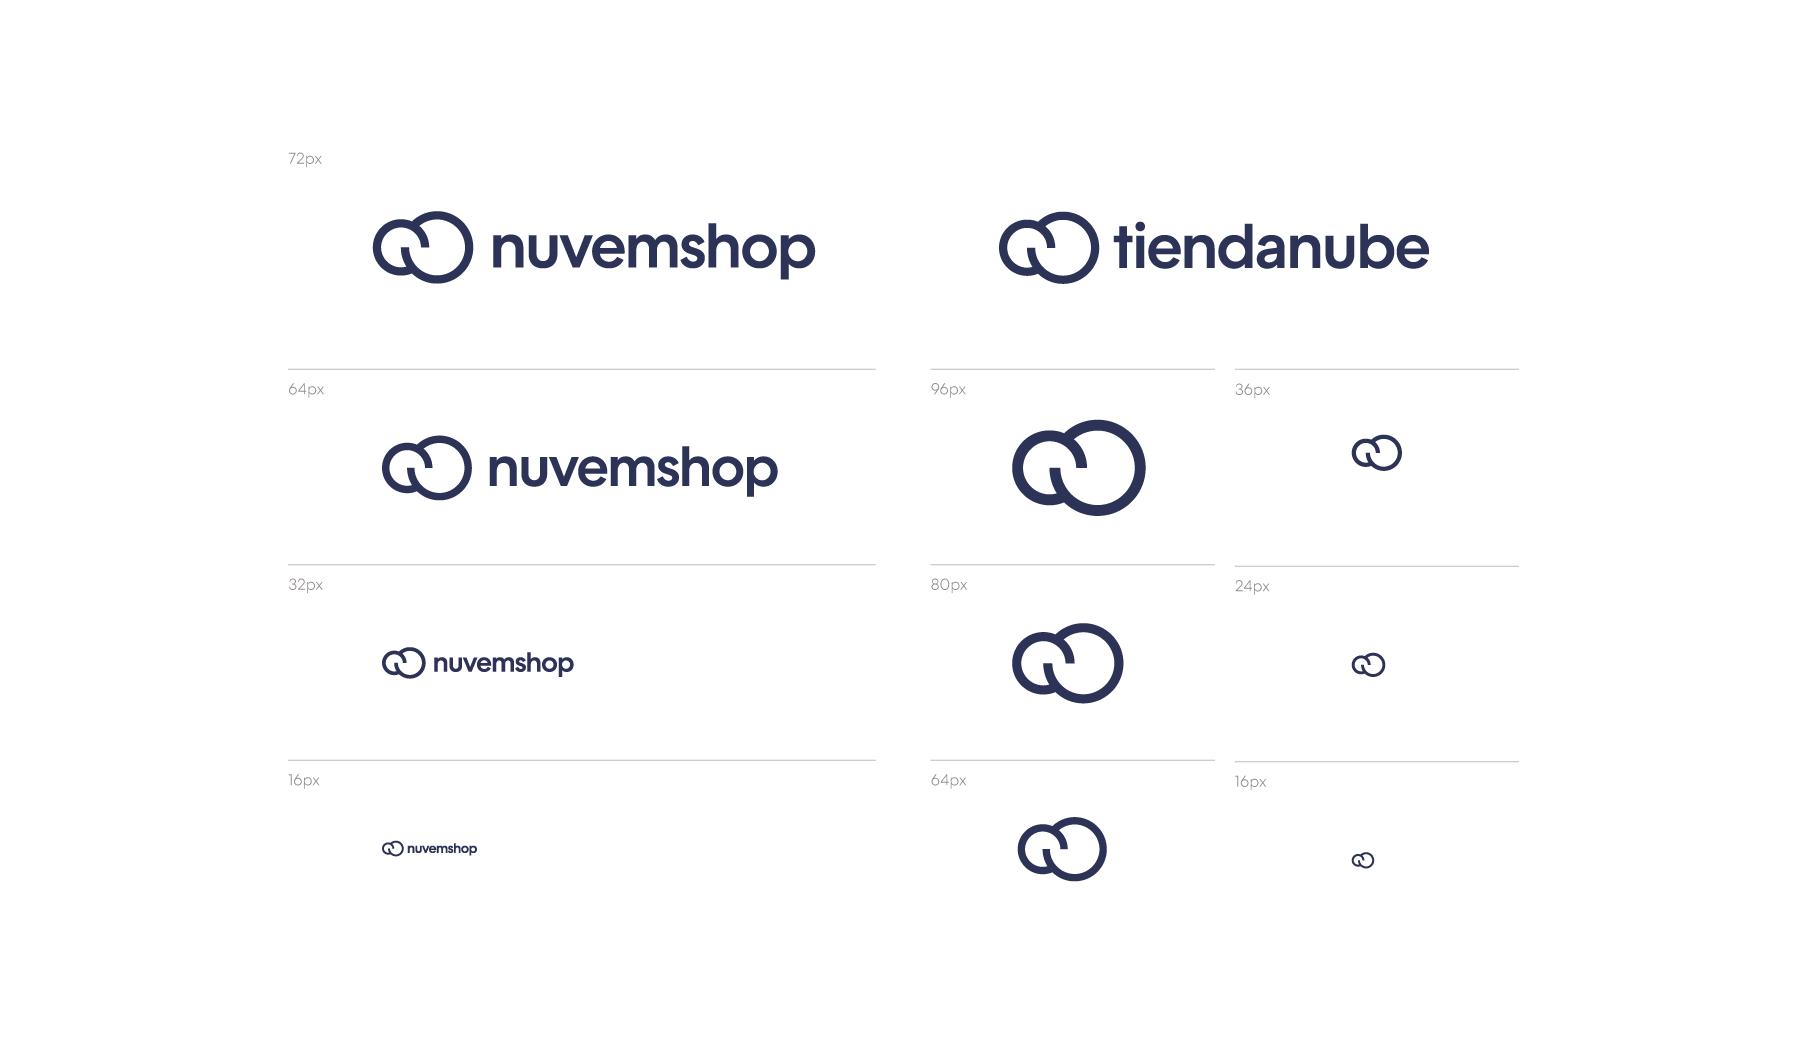 logotipos nuvemshop